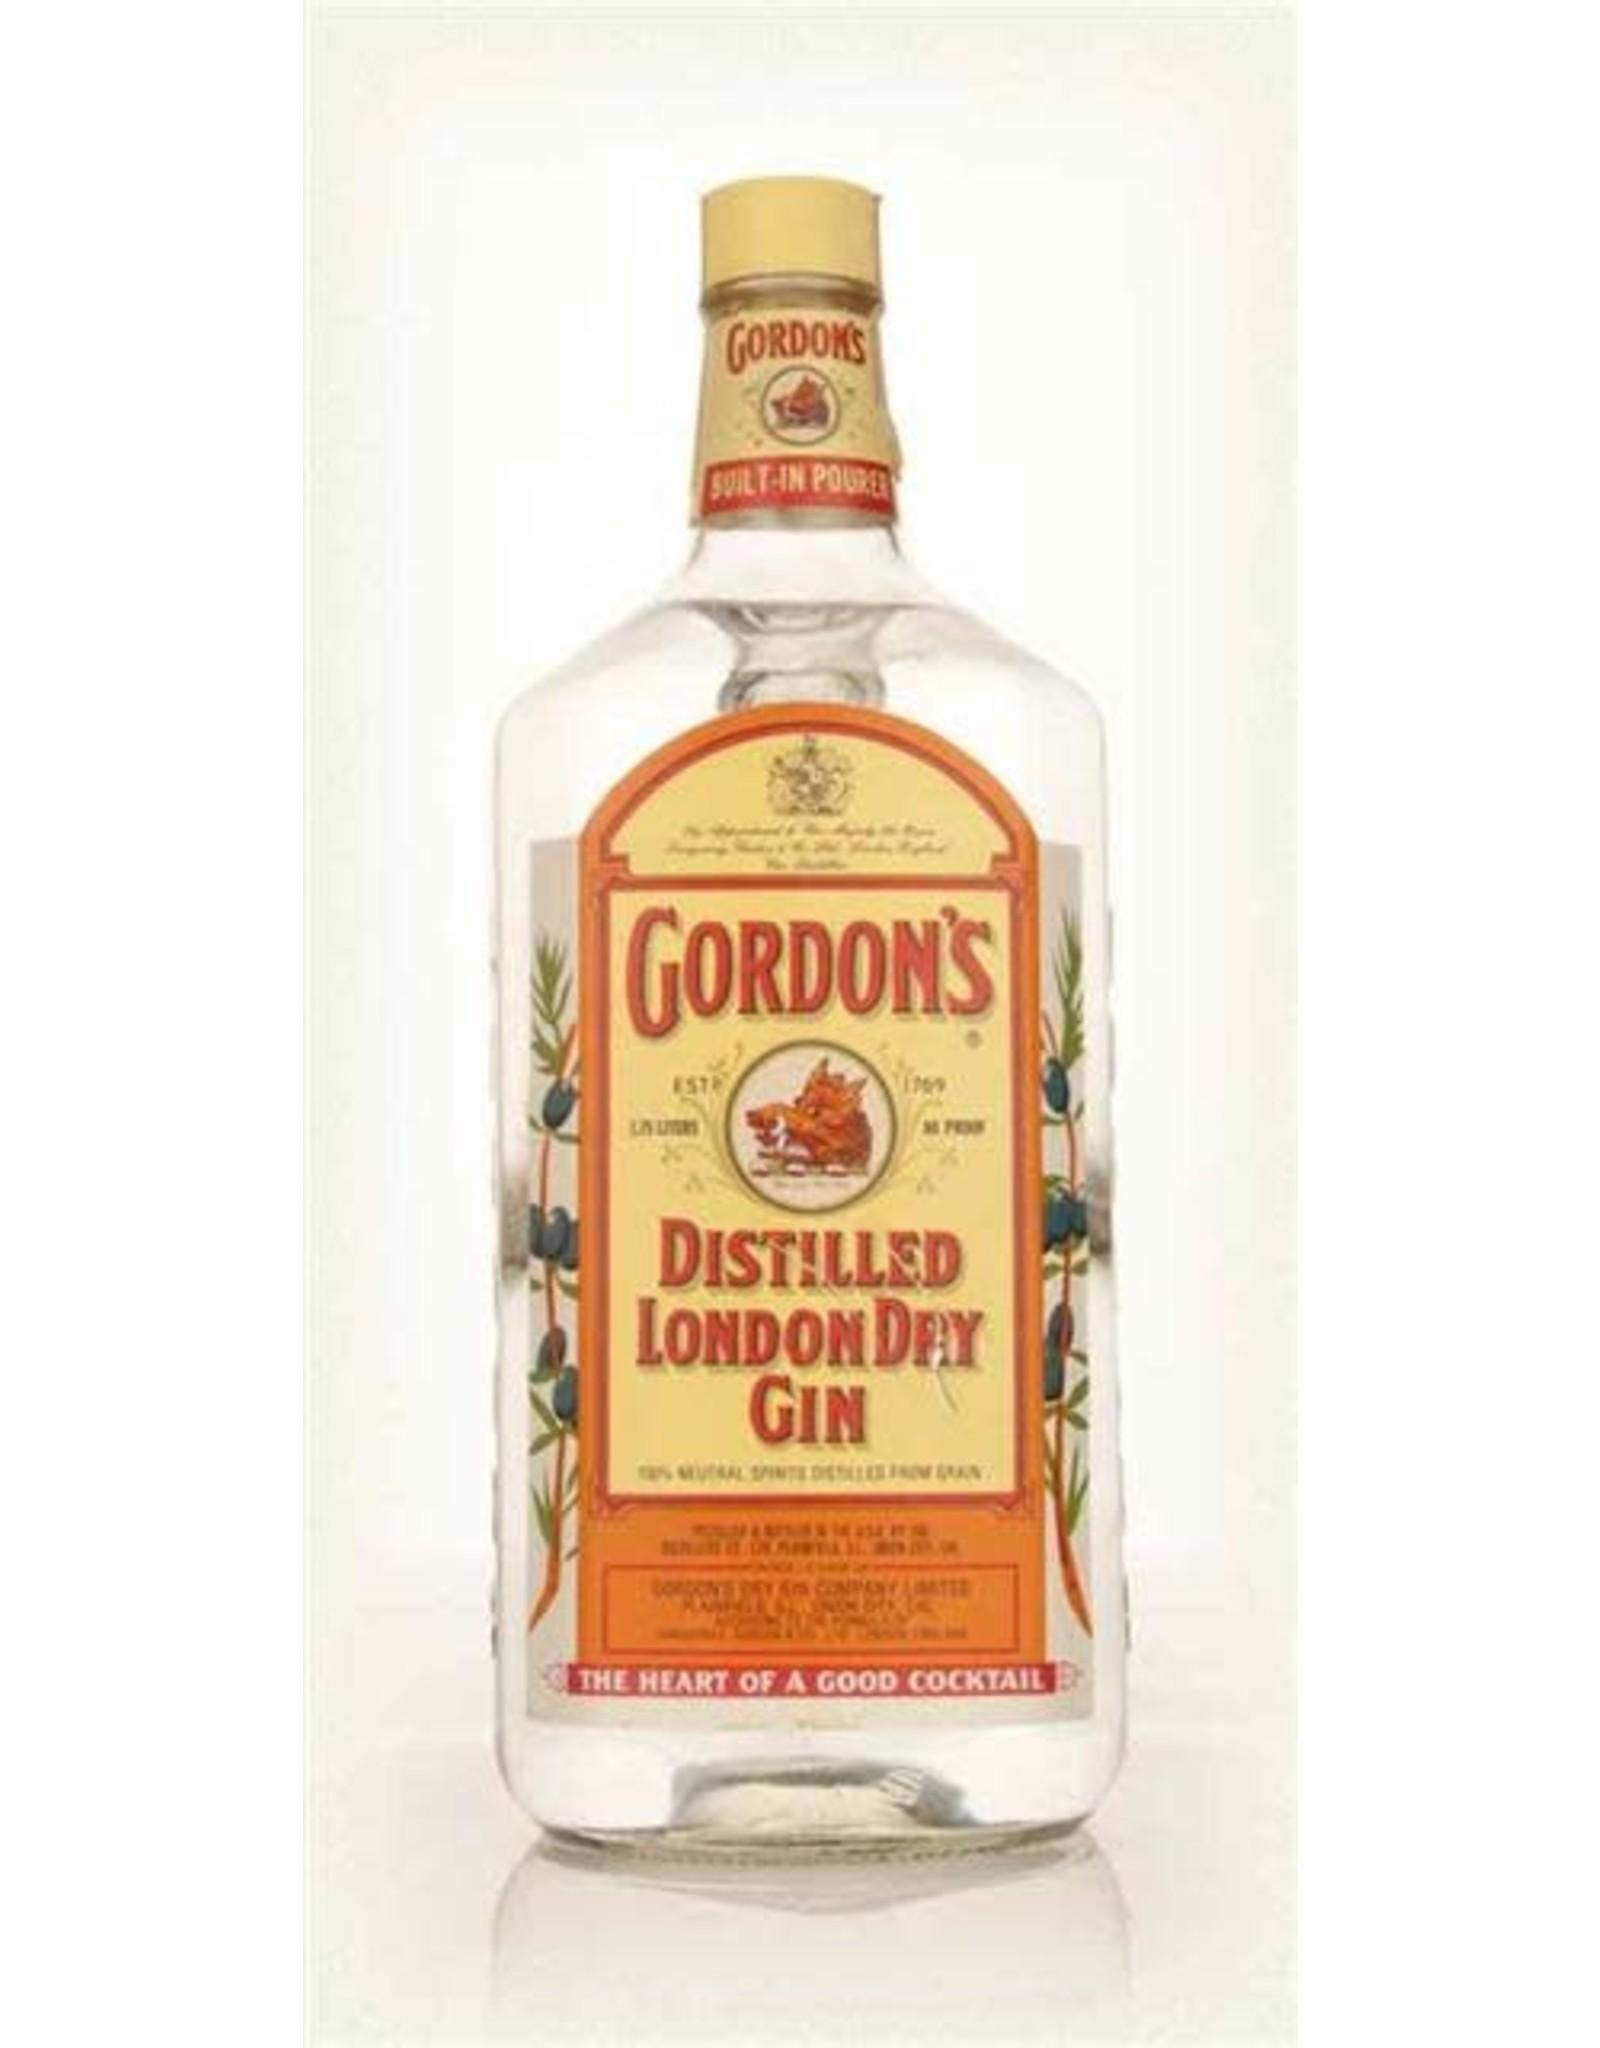 GORDONS LONDON DRY GIN 1.75L